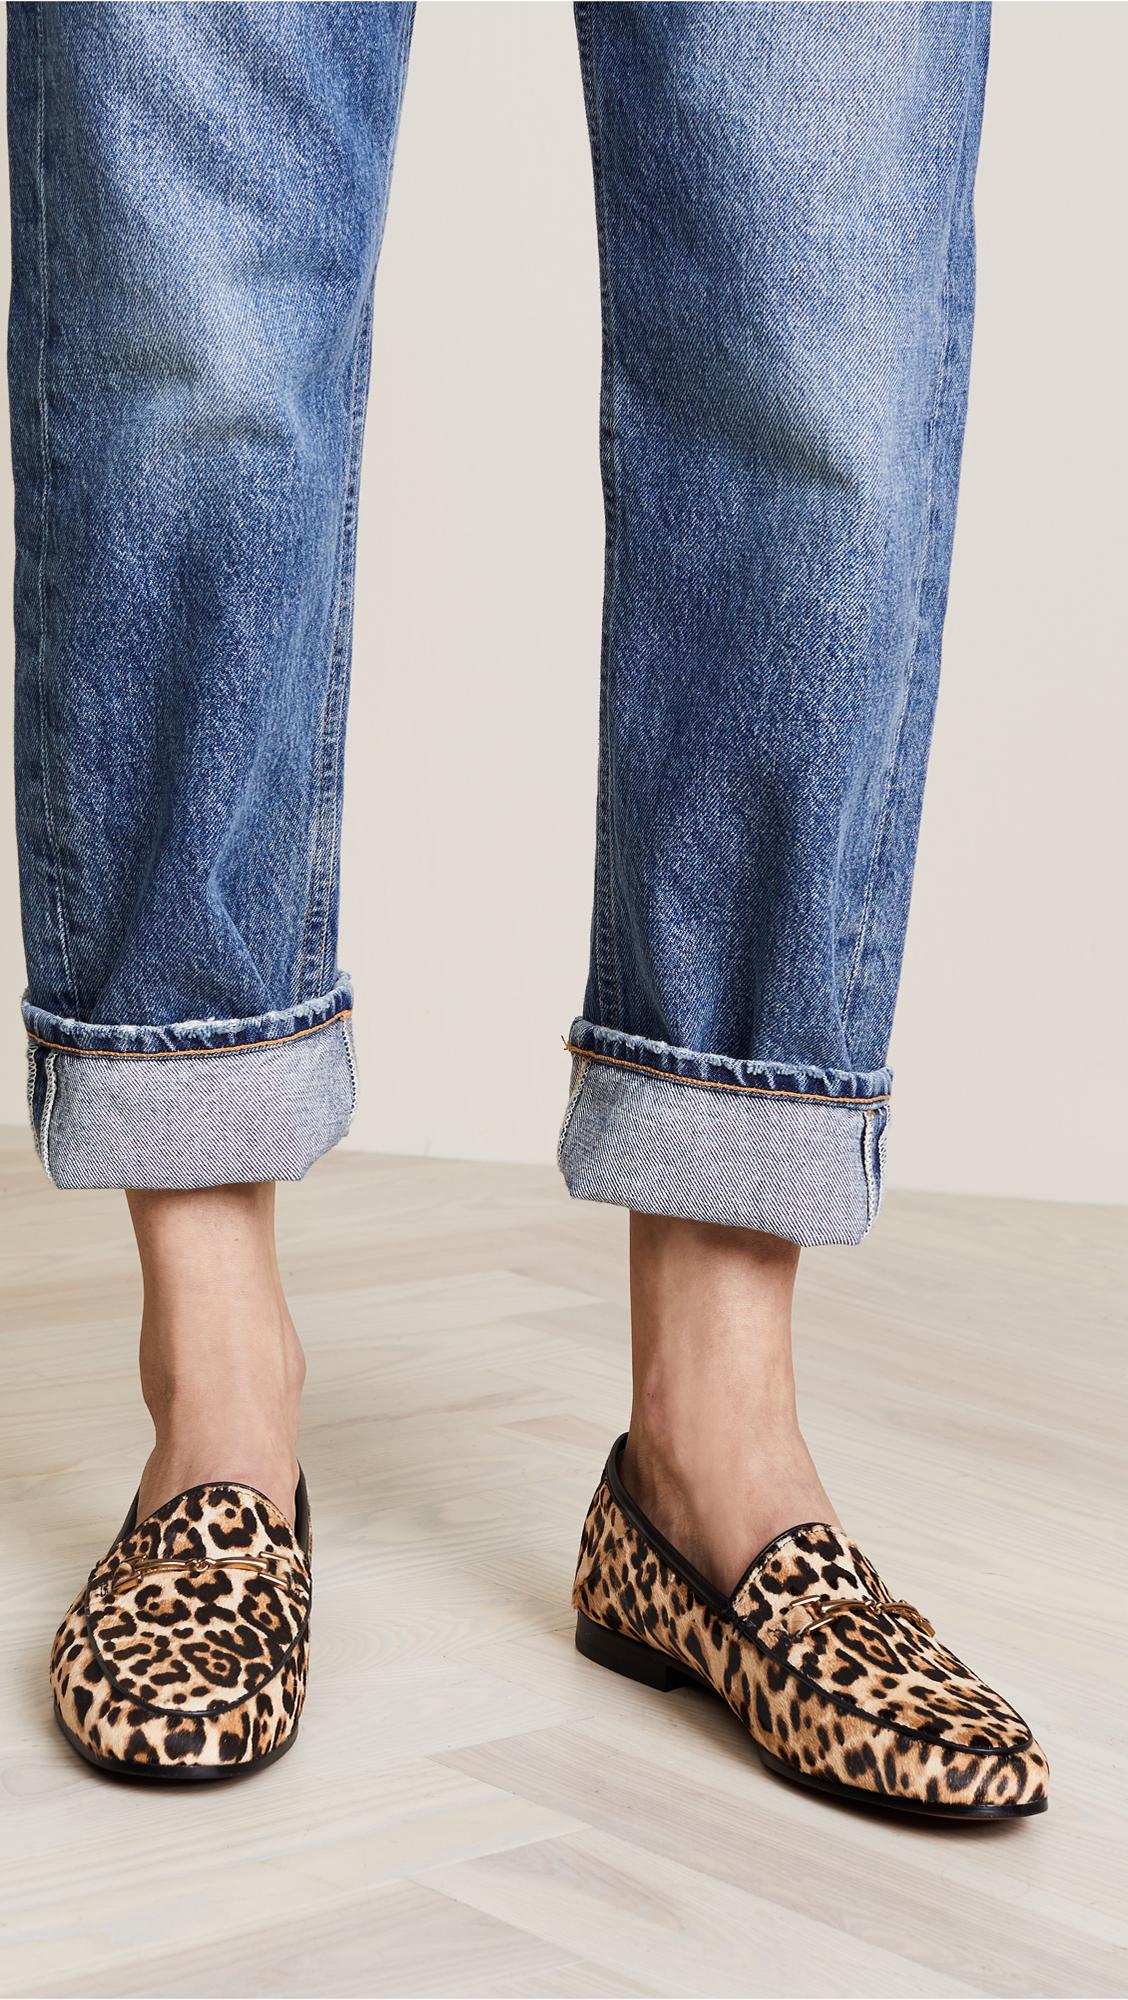 Shop Calf Hair Leopard Print Loafers